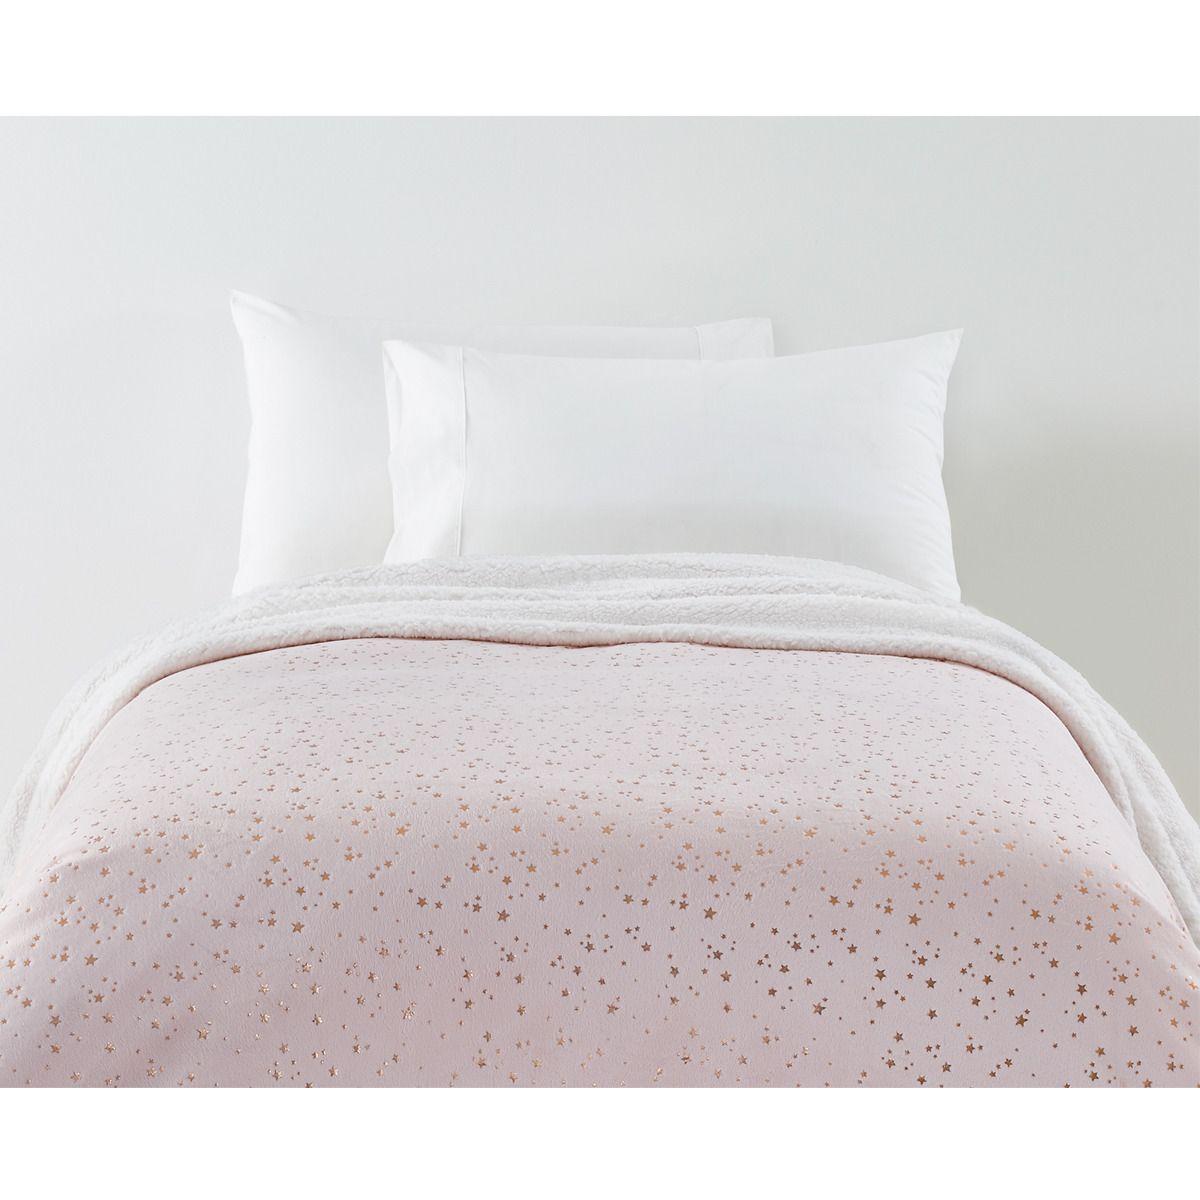 Stardust Reversible Blanket Single Bed Kmart Single Bed Bed Reversible Blanket